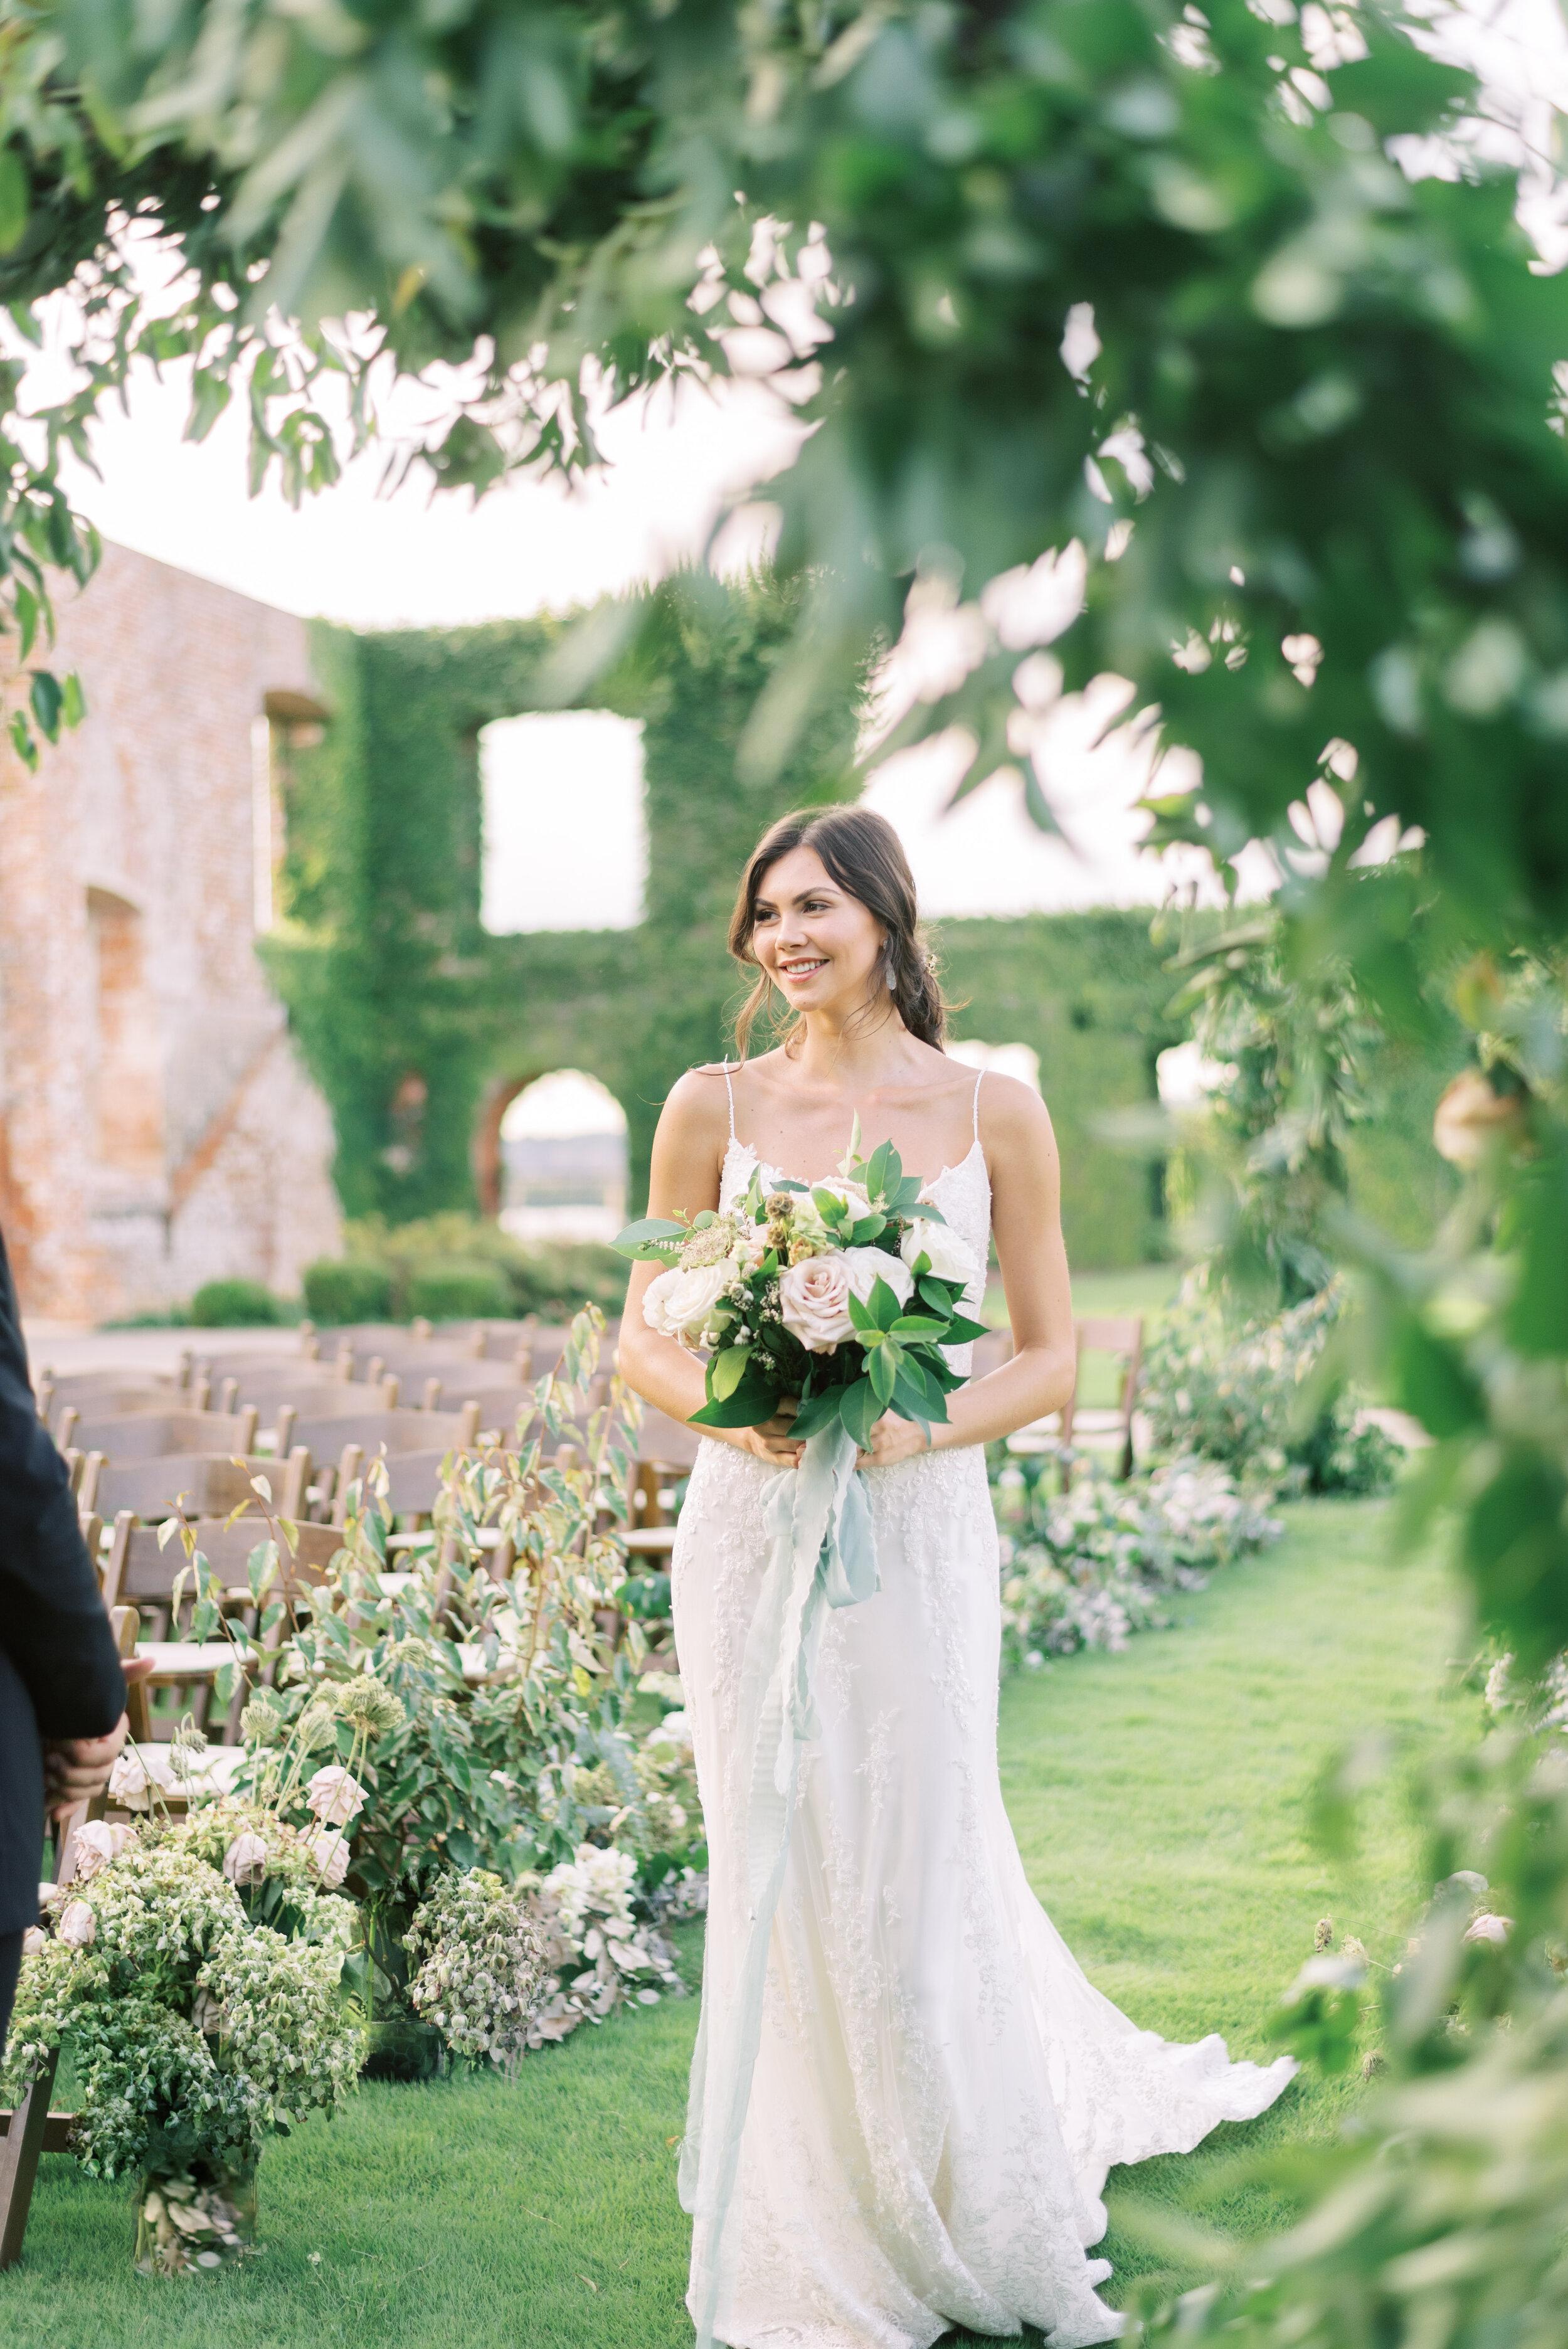 Bibb_Mill_Wedding_Editorial_Columbus_Georgia_Fallen_Photography_6-25.JPG